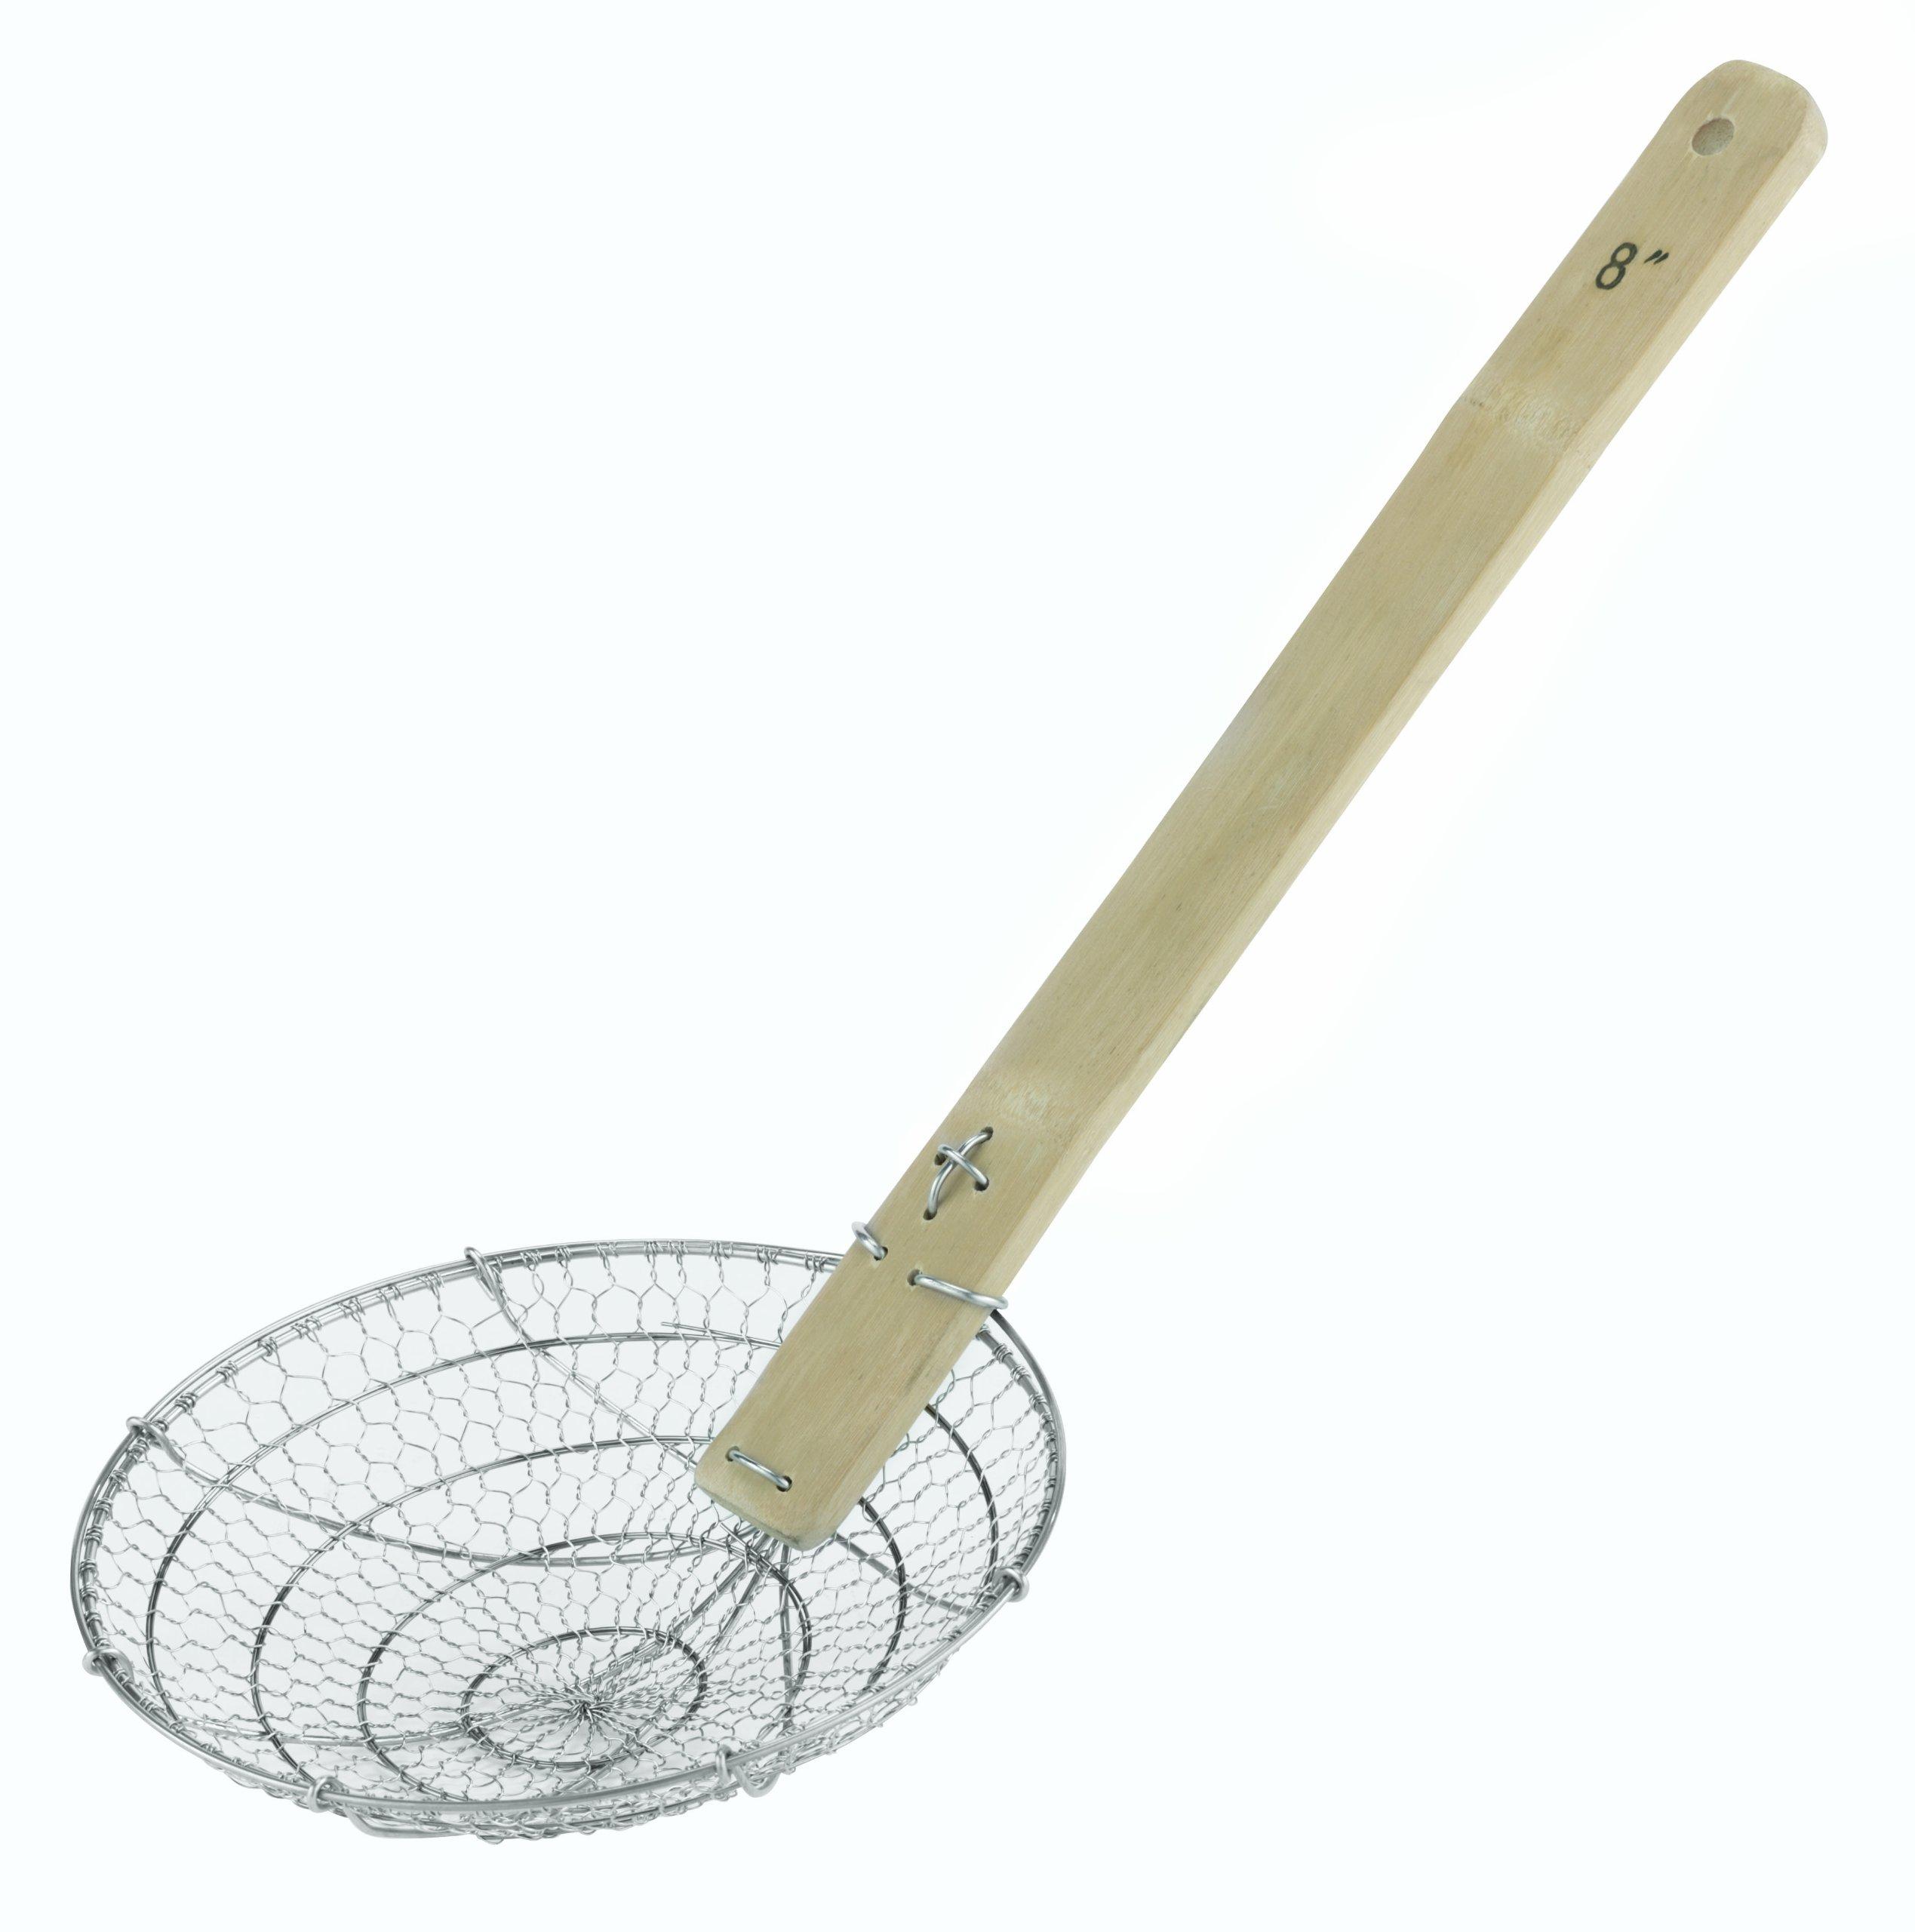 Paderno World Cuisine 7-7/8-Inch Long Chinese Deep Frying Skimmer, Coarse Mesh